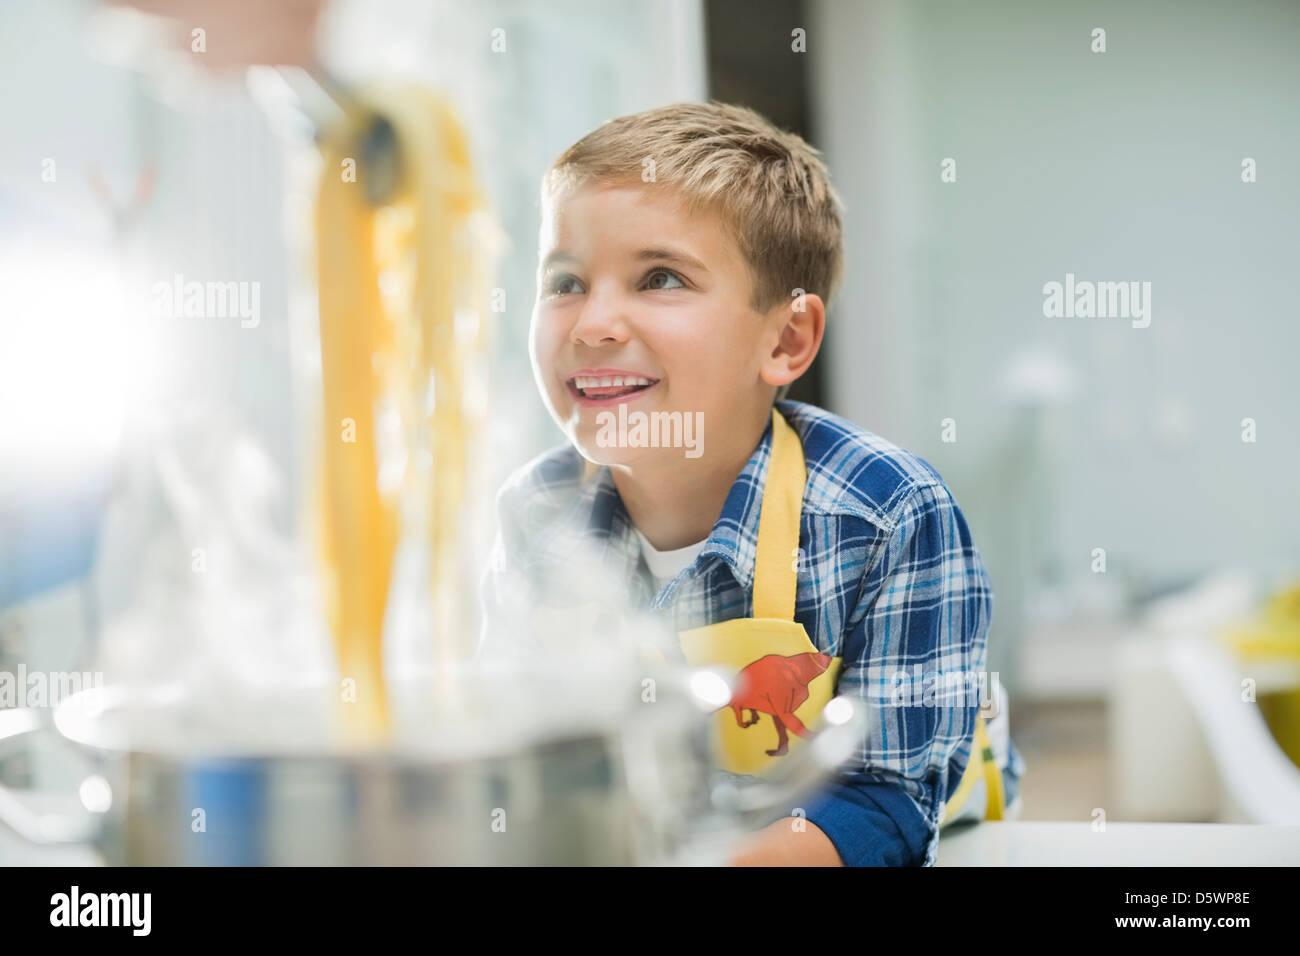 Boy smiling in kitchen Photo Stock